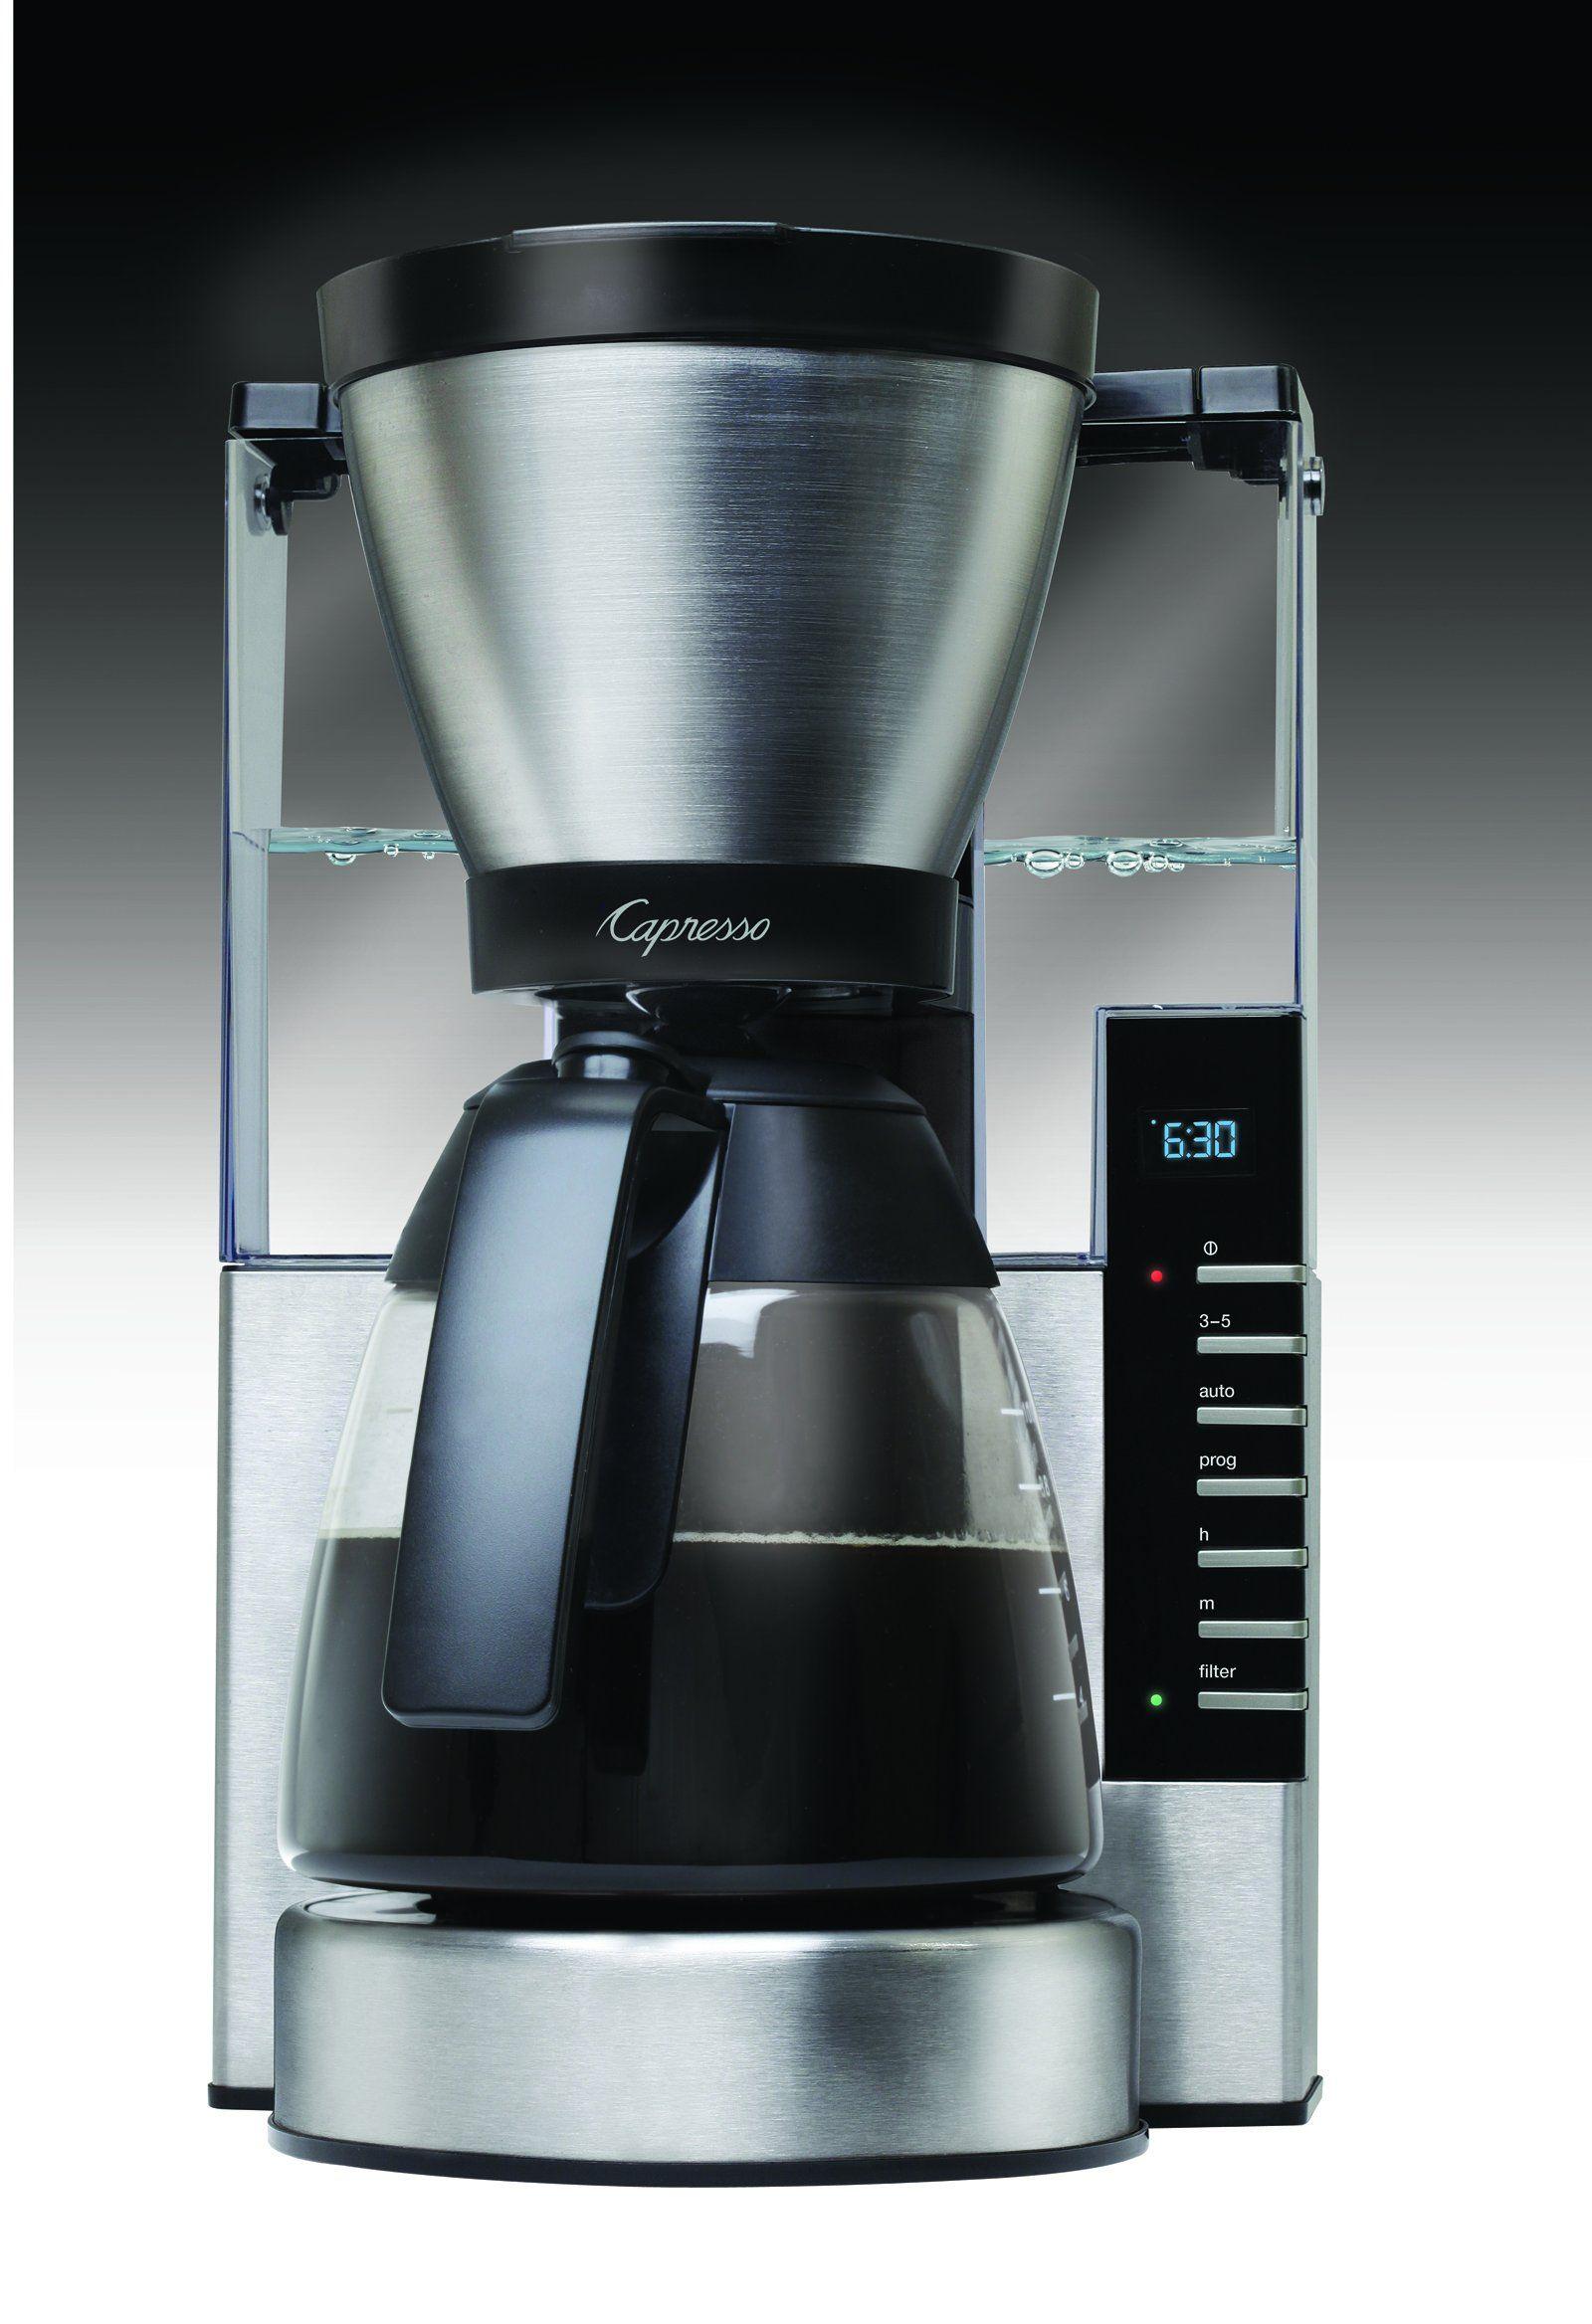 Capresso 497.05 MG900 10 cup Rapid Brew Coffeemaker